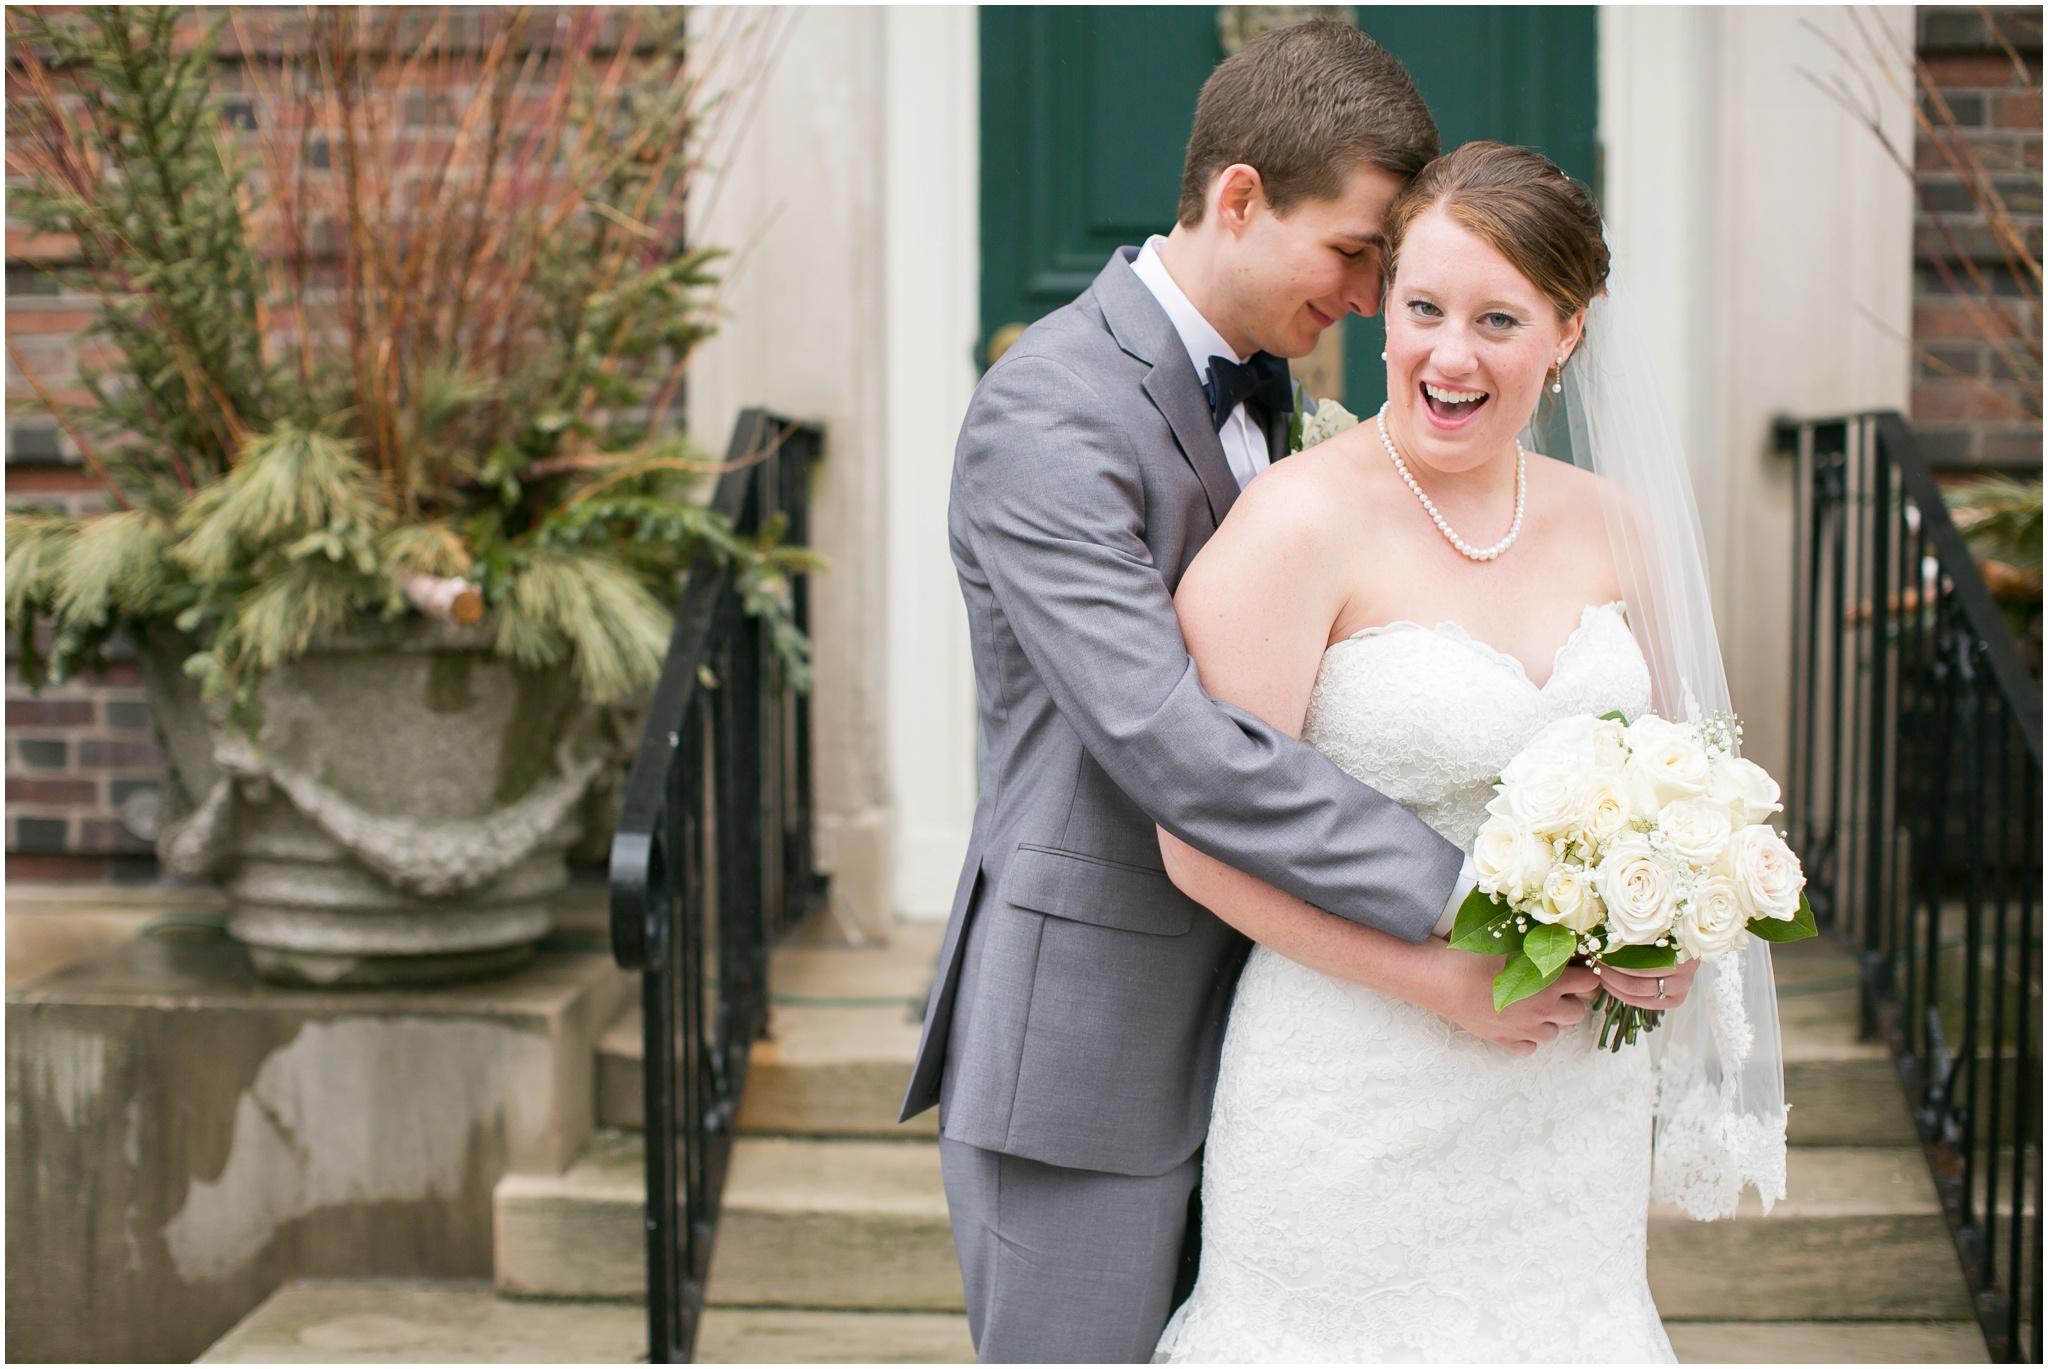 Madison_Club_Madison_Wisconsin_Wedding_Photographer_Spring_Rainy_Wedding_2625.jpg